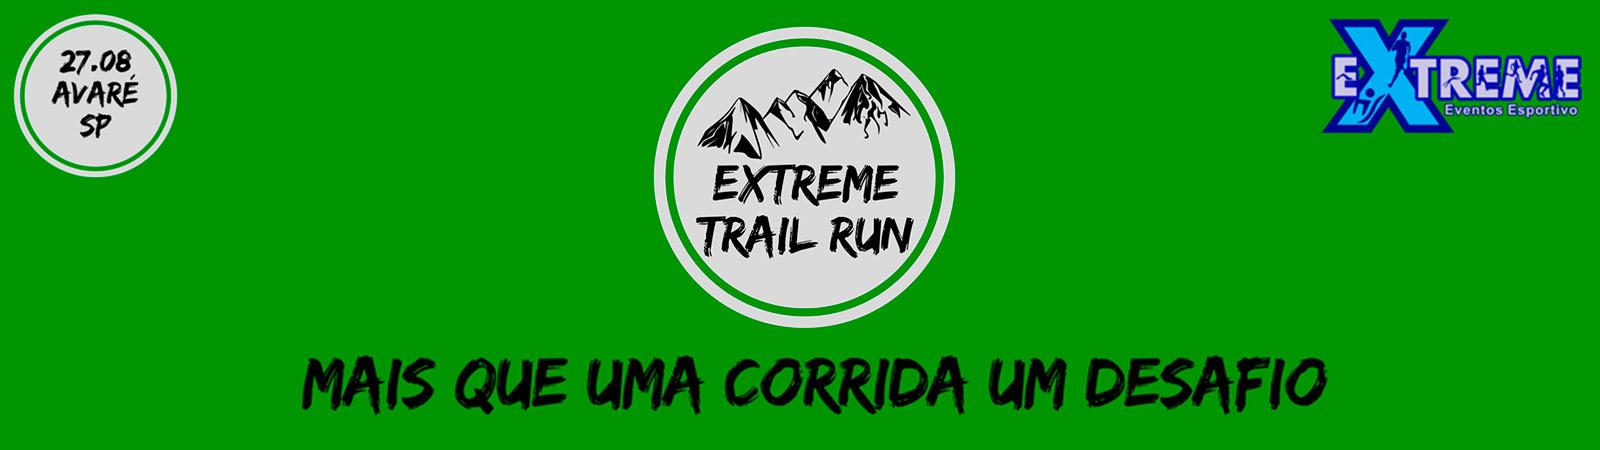 2ª EXTREME TRAIL RUN - Imagem de topo